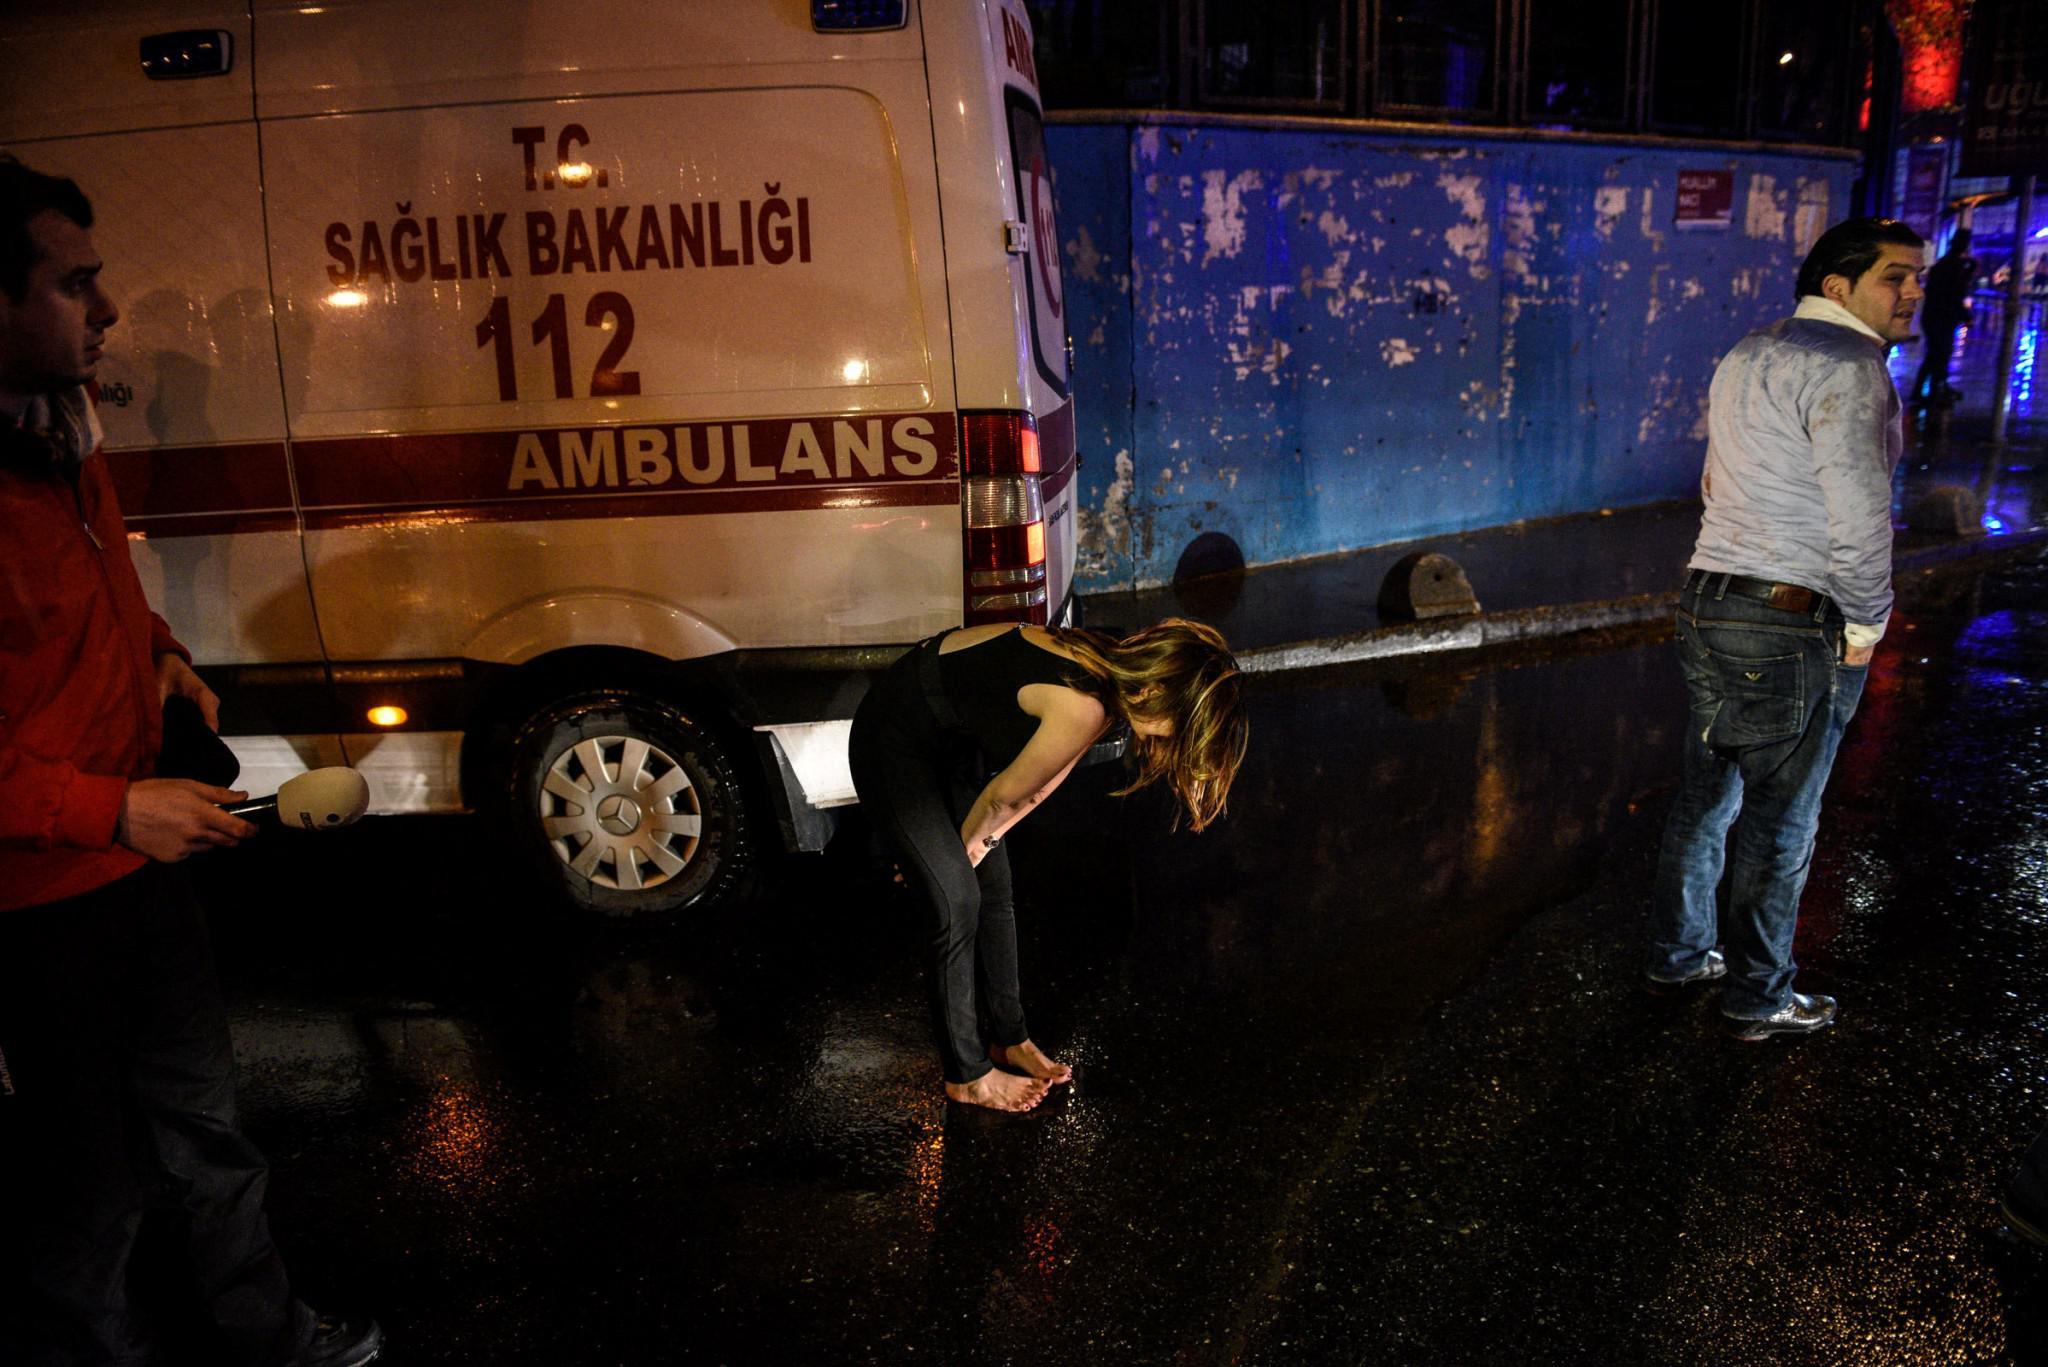 tourkia-epithesi-klamp-nekroi-4 Έτσι σκόρπισε τον θάνατο ο μακελάρης της Κωνσταντινούπολης [εικόνες & βίντεο]